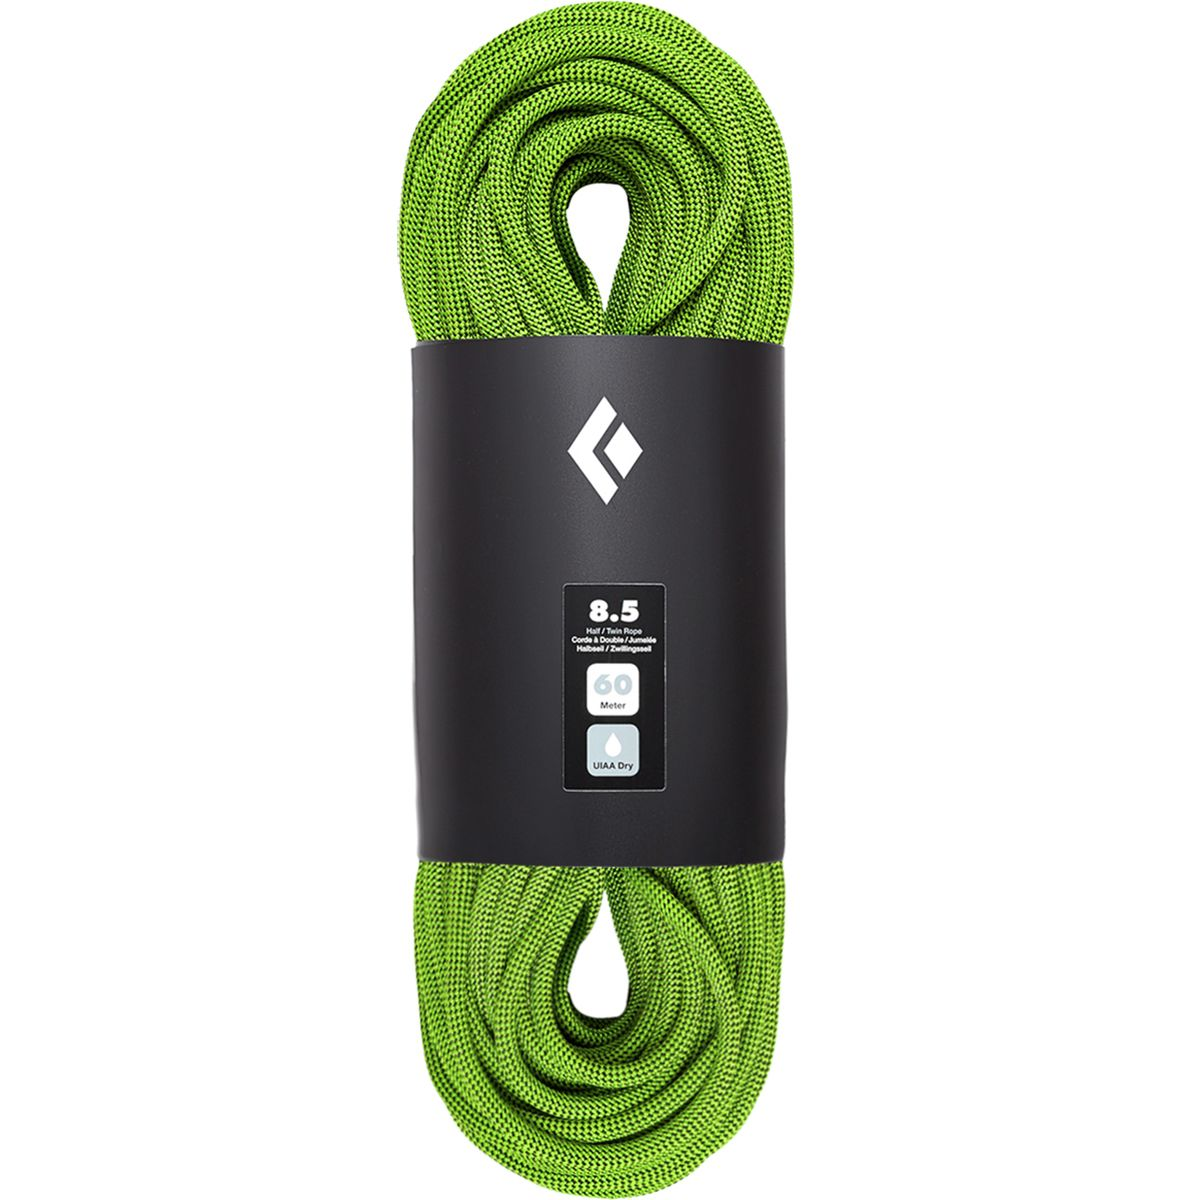 photo: Black Diamond 8.5 Dry Climbing Rope dynamic rope